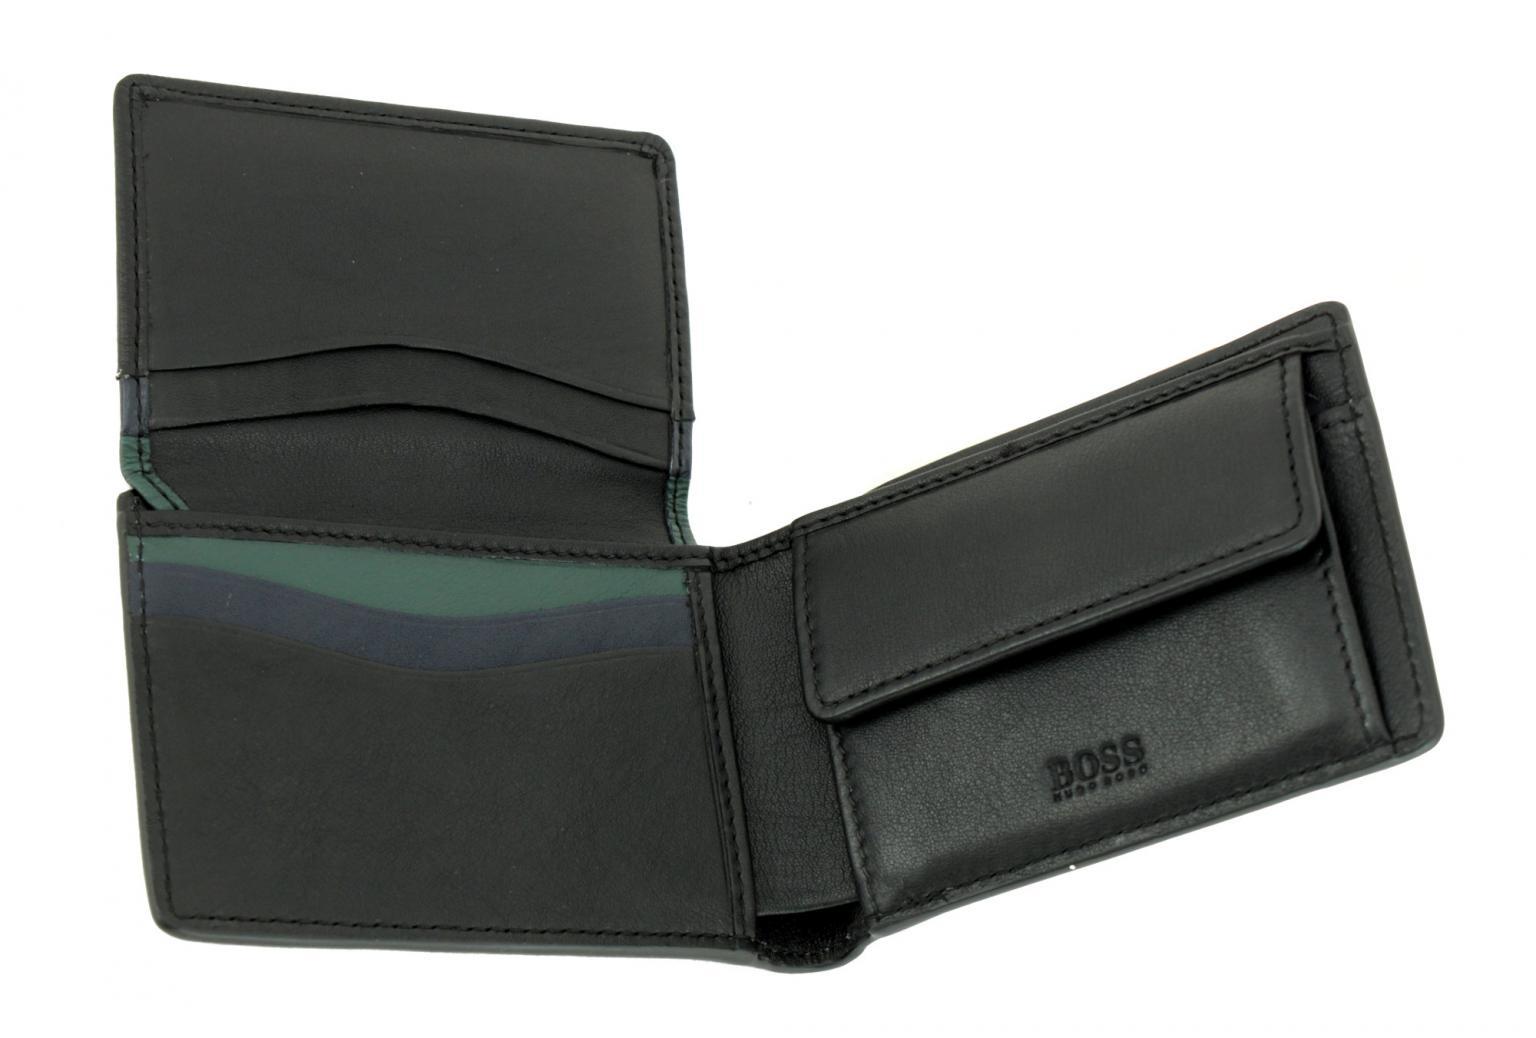 0e6885324e130 Hugo Boss Majestic flap Geldtäschchen Herren Leder schwarz - Bags   more